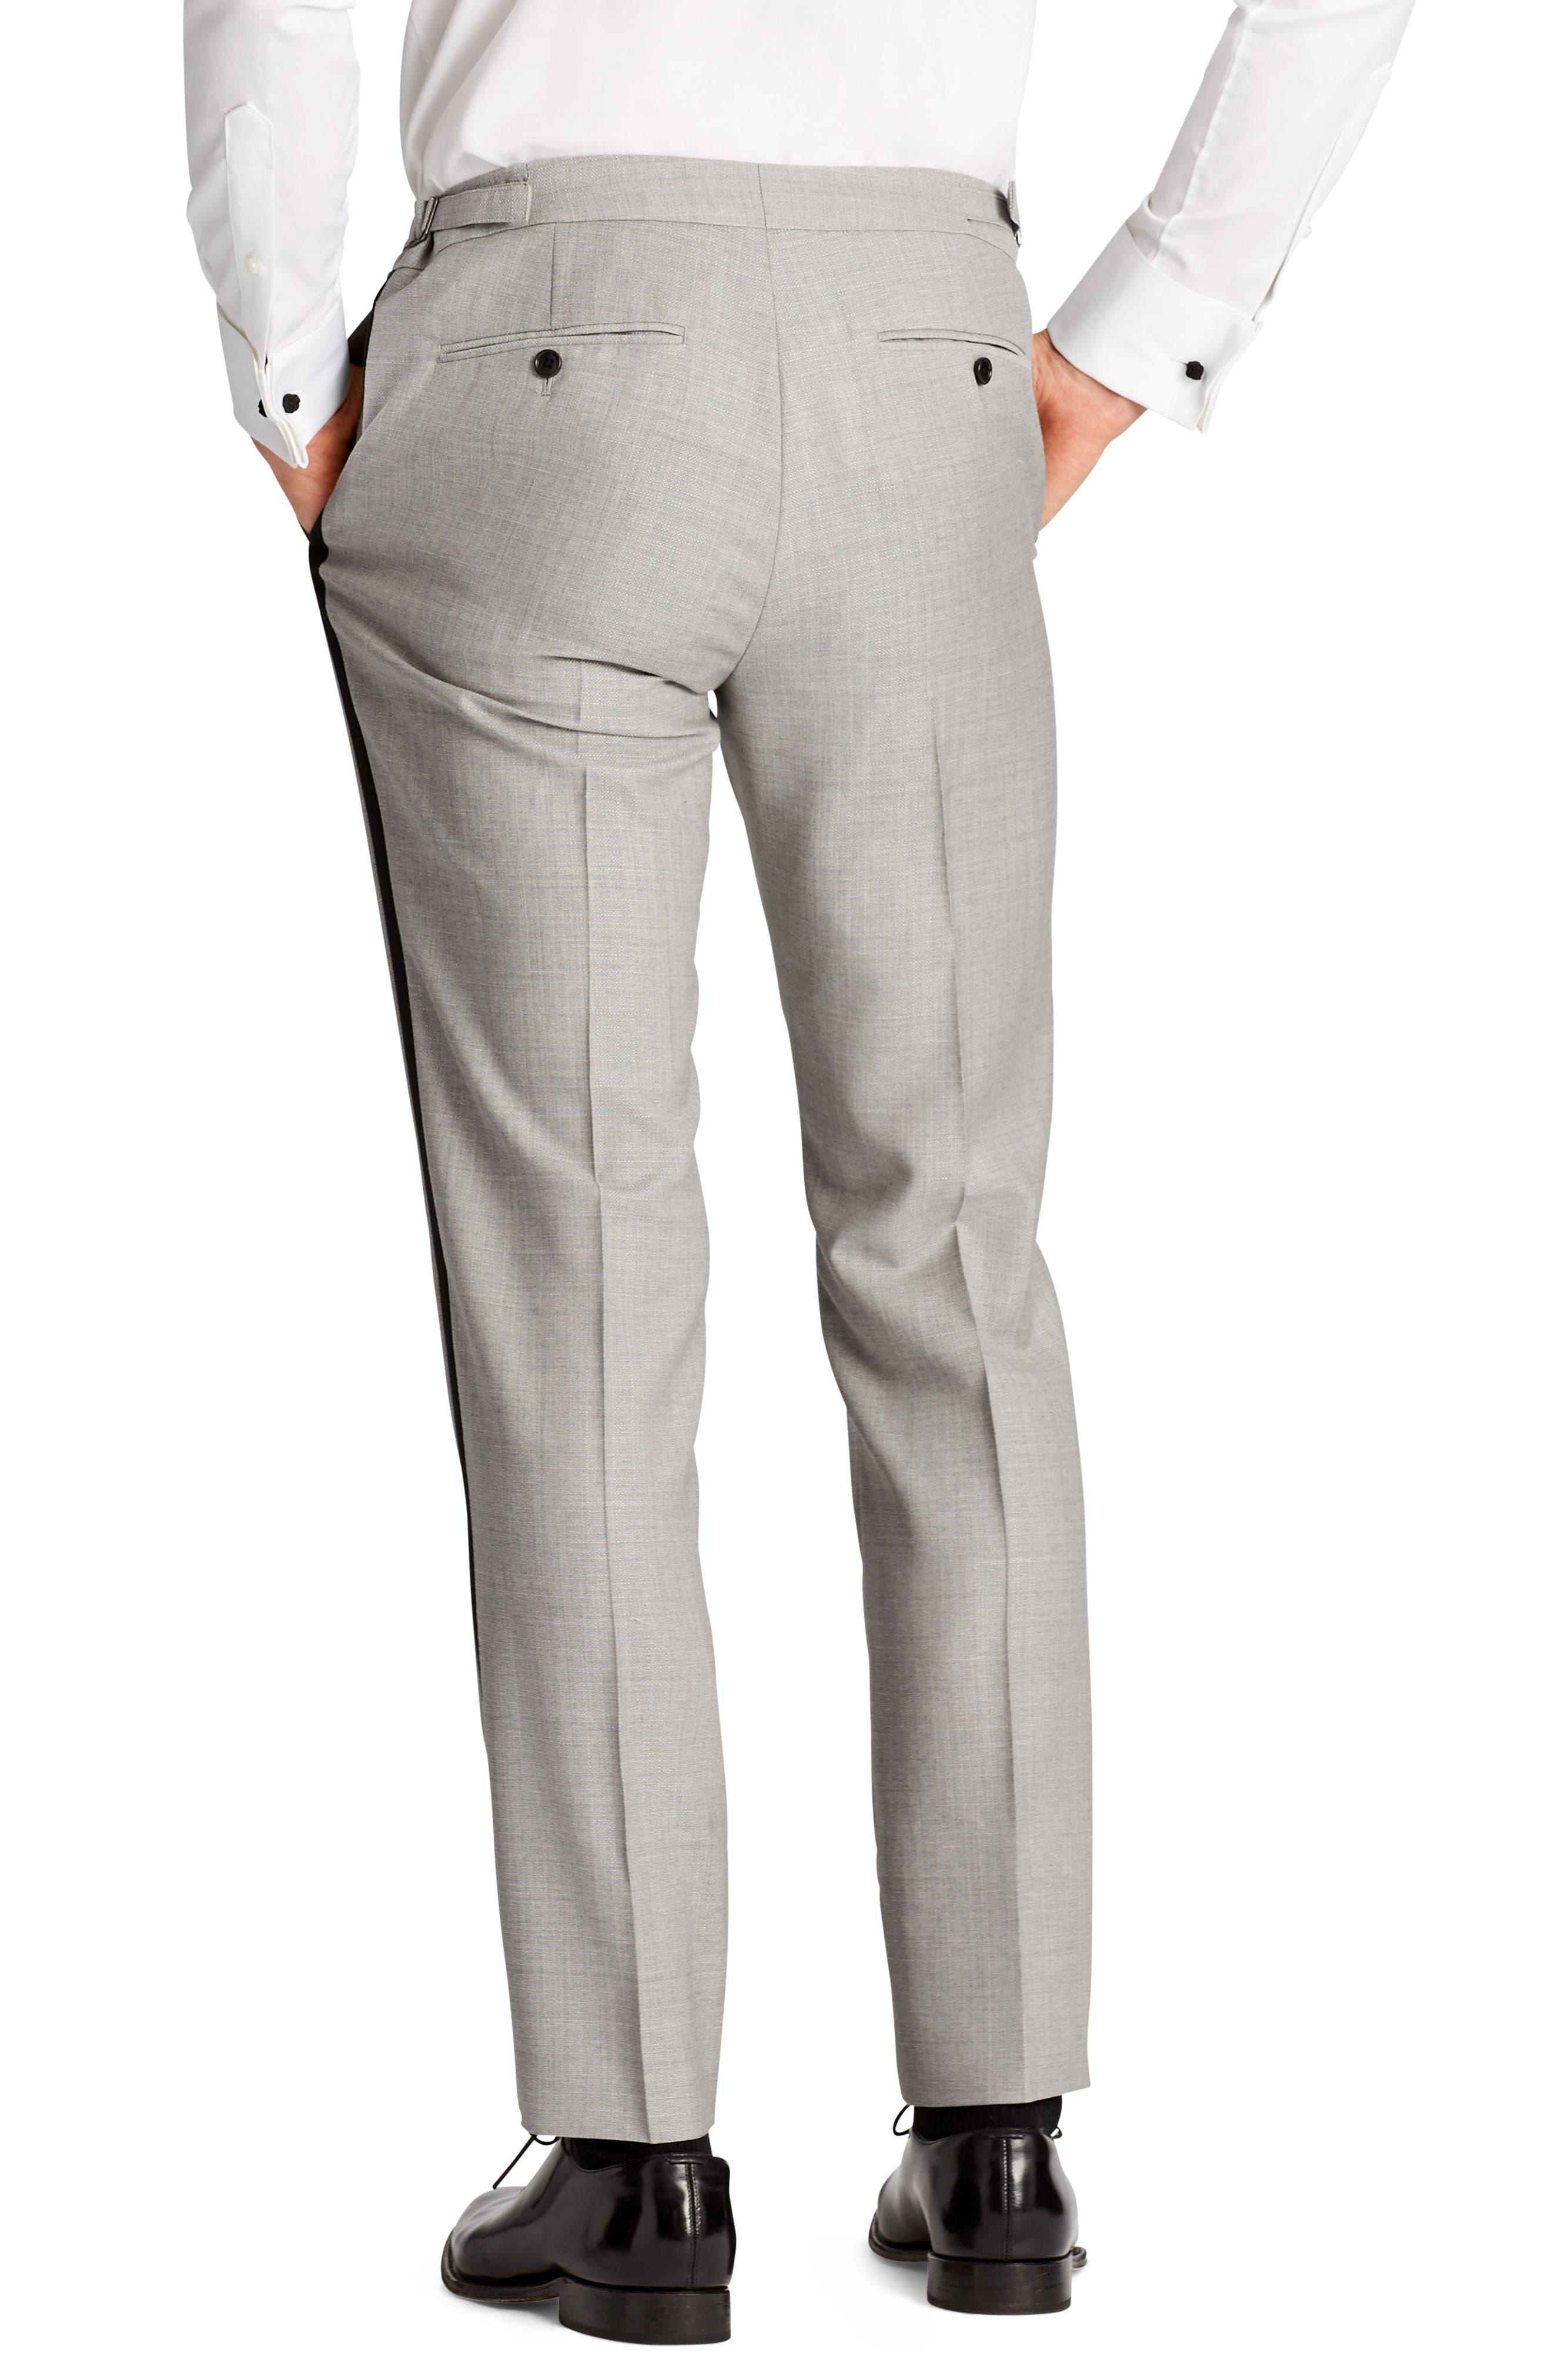 Capstone Flat Front Tuxedo Trousers,                             Alternate thumbnail 2, color,                             020